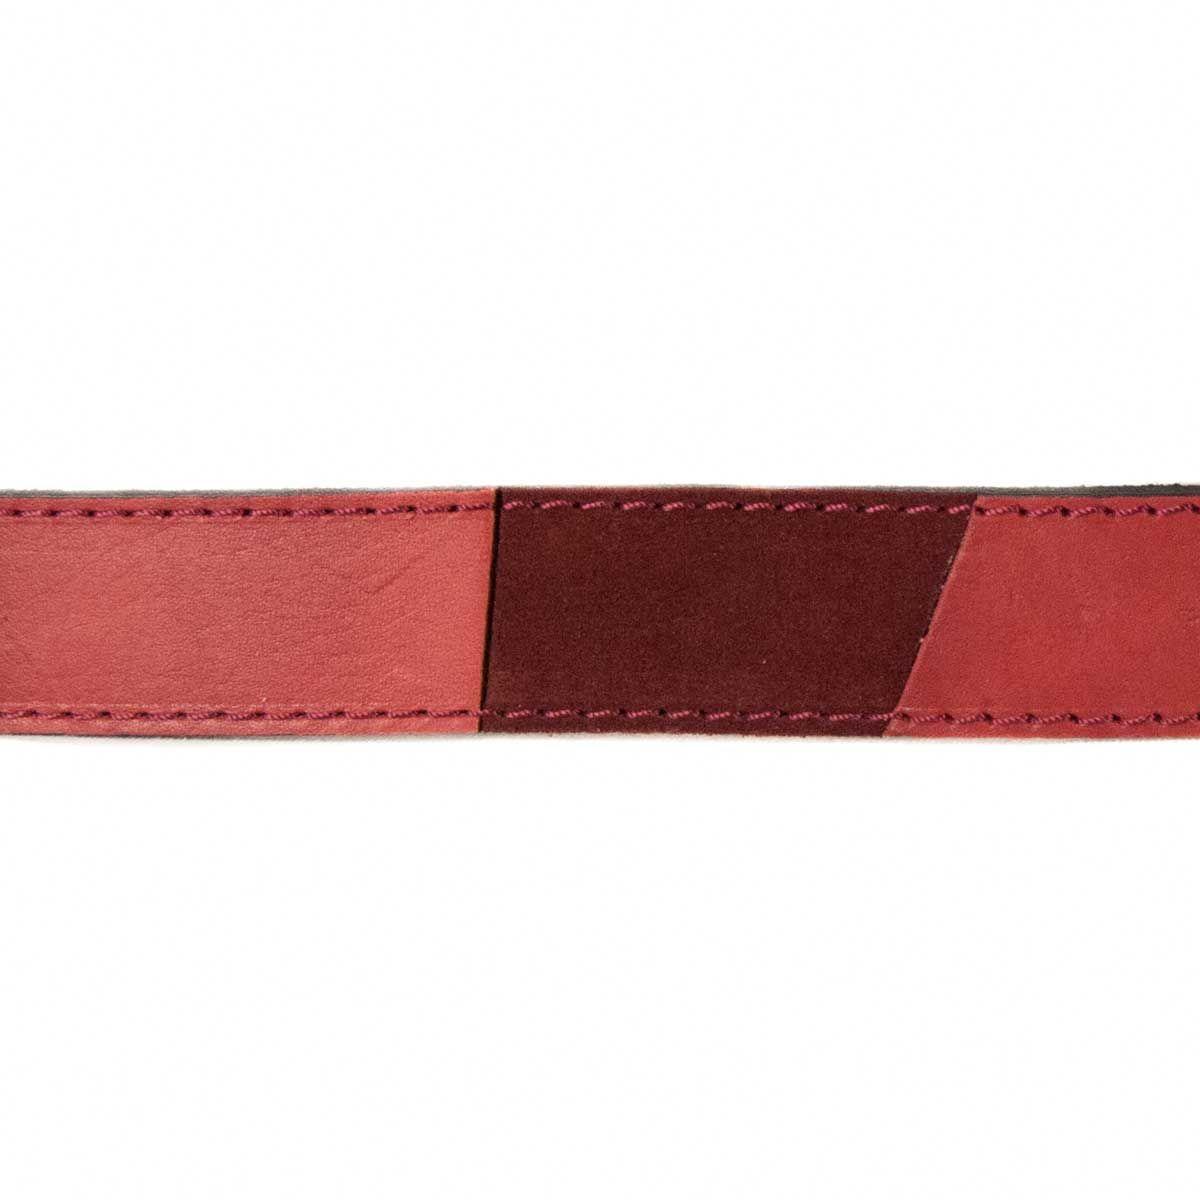 Montevita Casual Quality Belt in Bordo